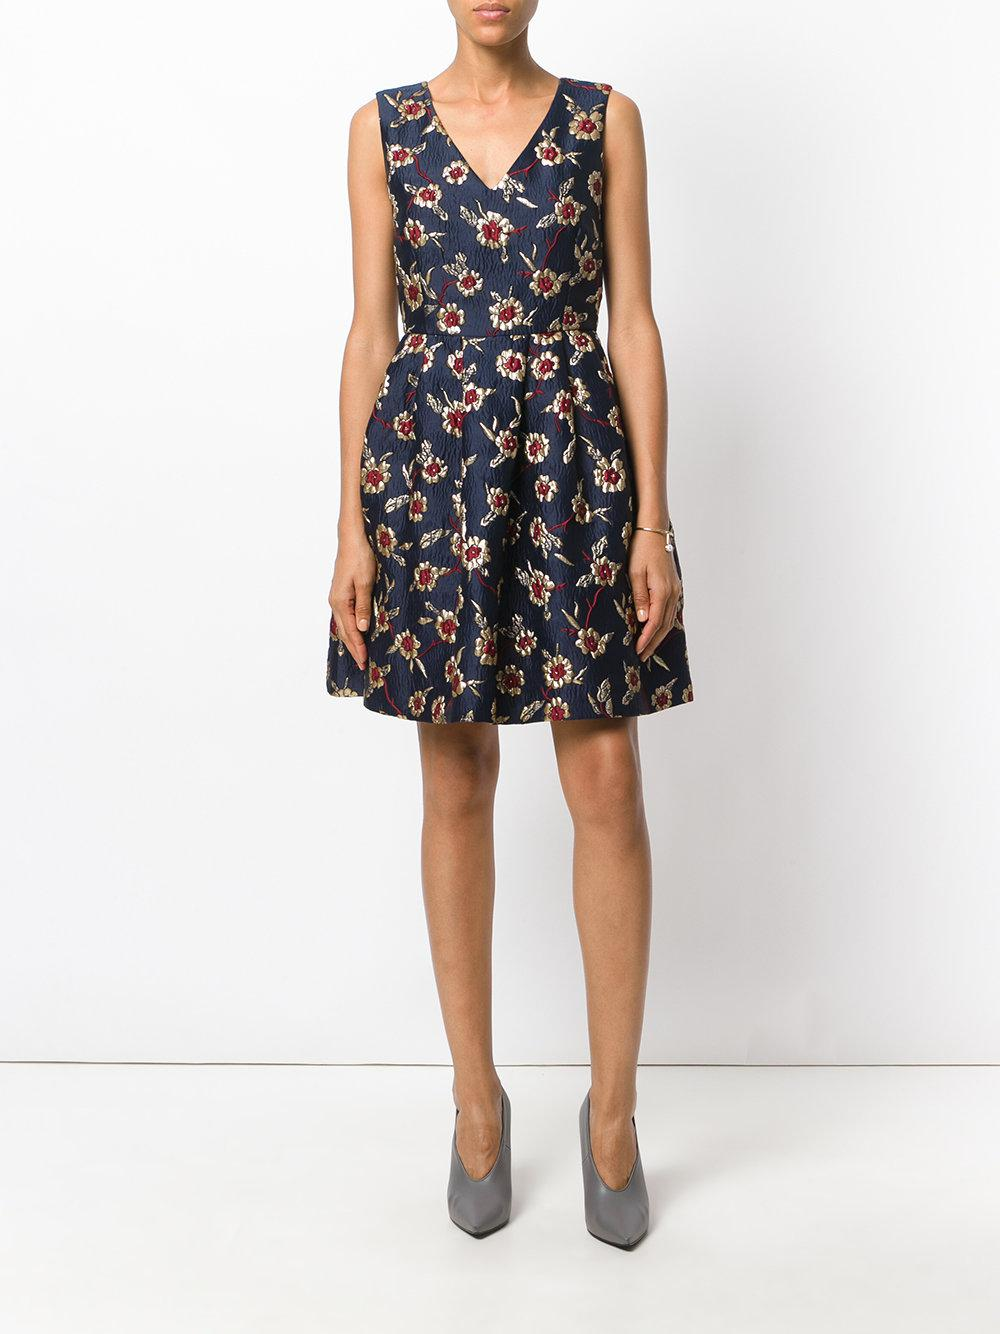 Find great deals on Womens Blue Dresses at Kohl's today! Sponsored Links Women's Simply Vera Vera Wang V-Neck Fit & Flare Dress + sale. $ Original $ Plus Size Croft & Barrow® Smocked Tank Dress. sale. $ Original $